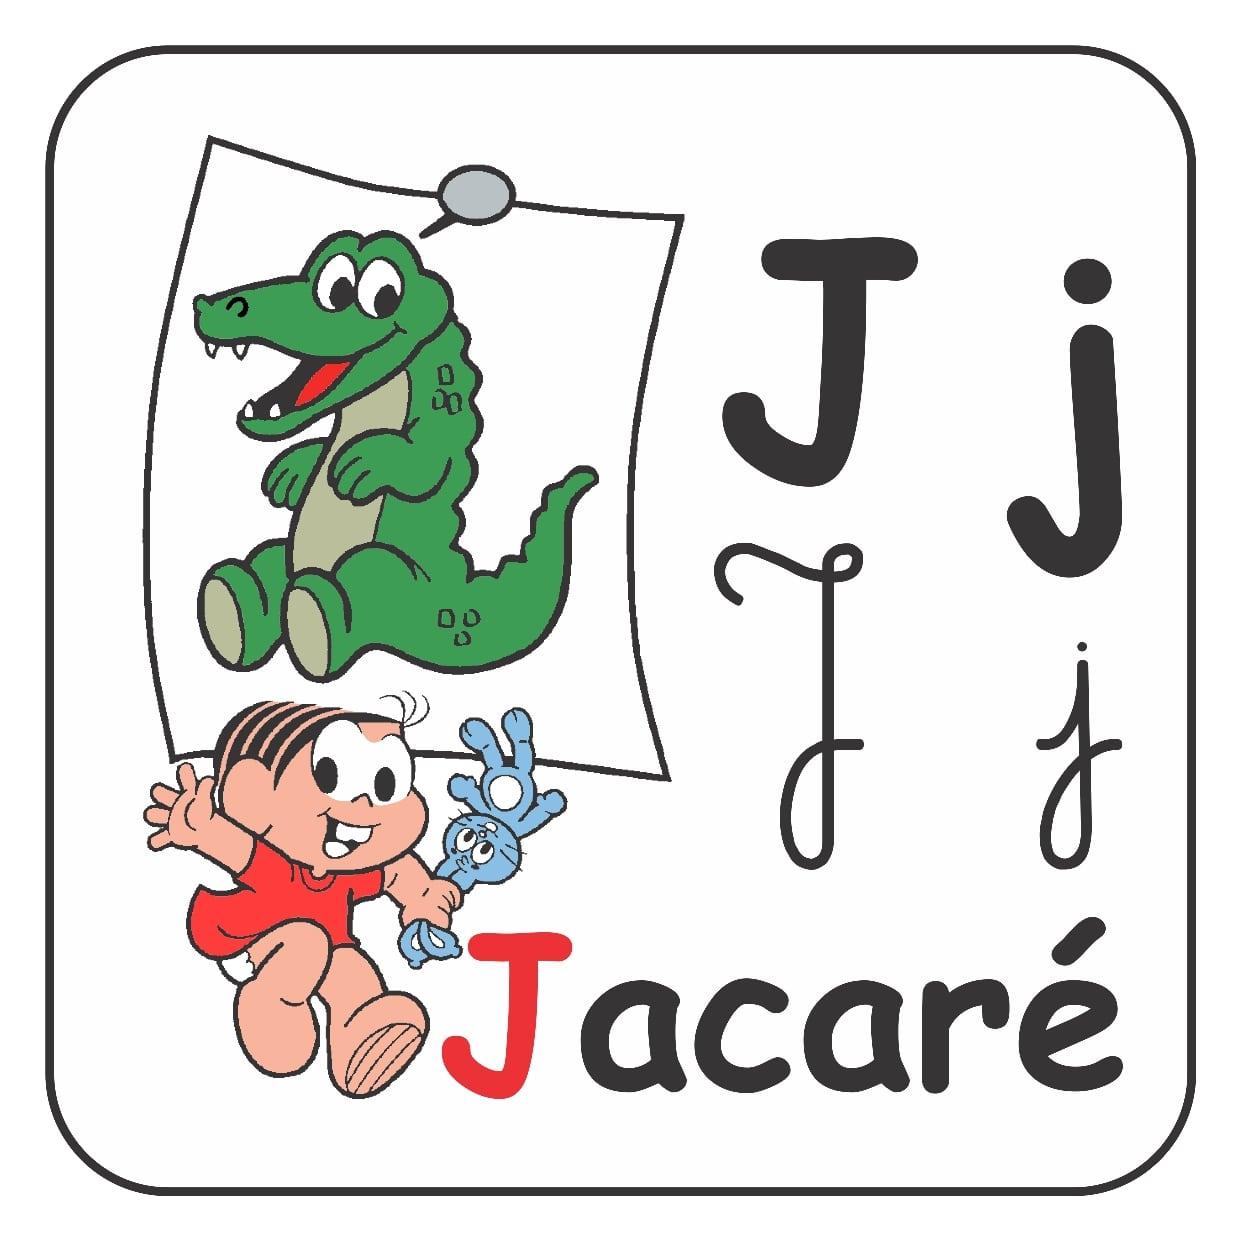 Alfabeto Ilustrado Com Letra Maiúscula E Minúscula Para Imprimir